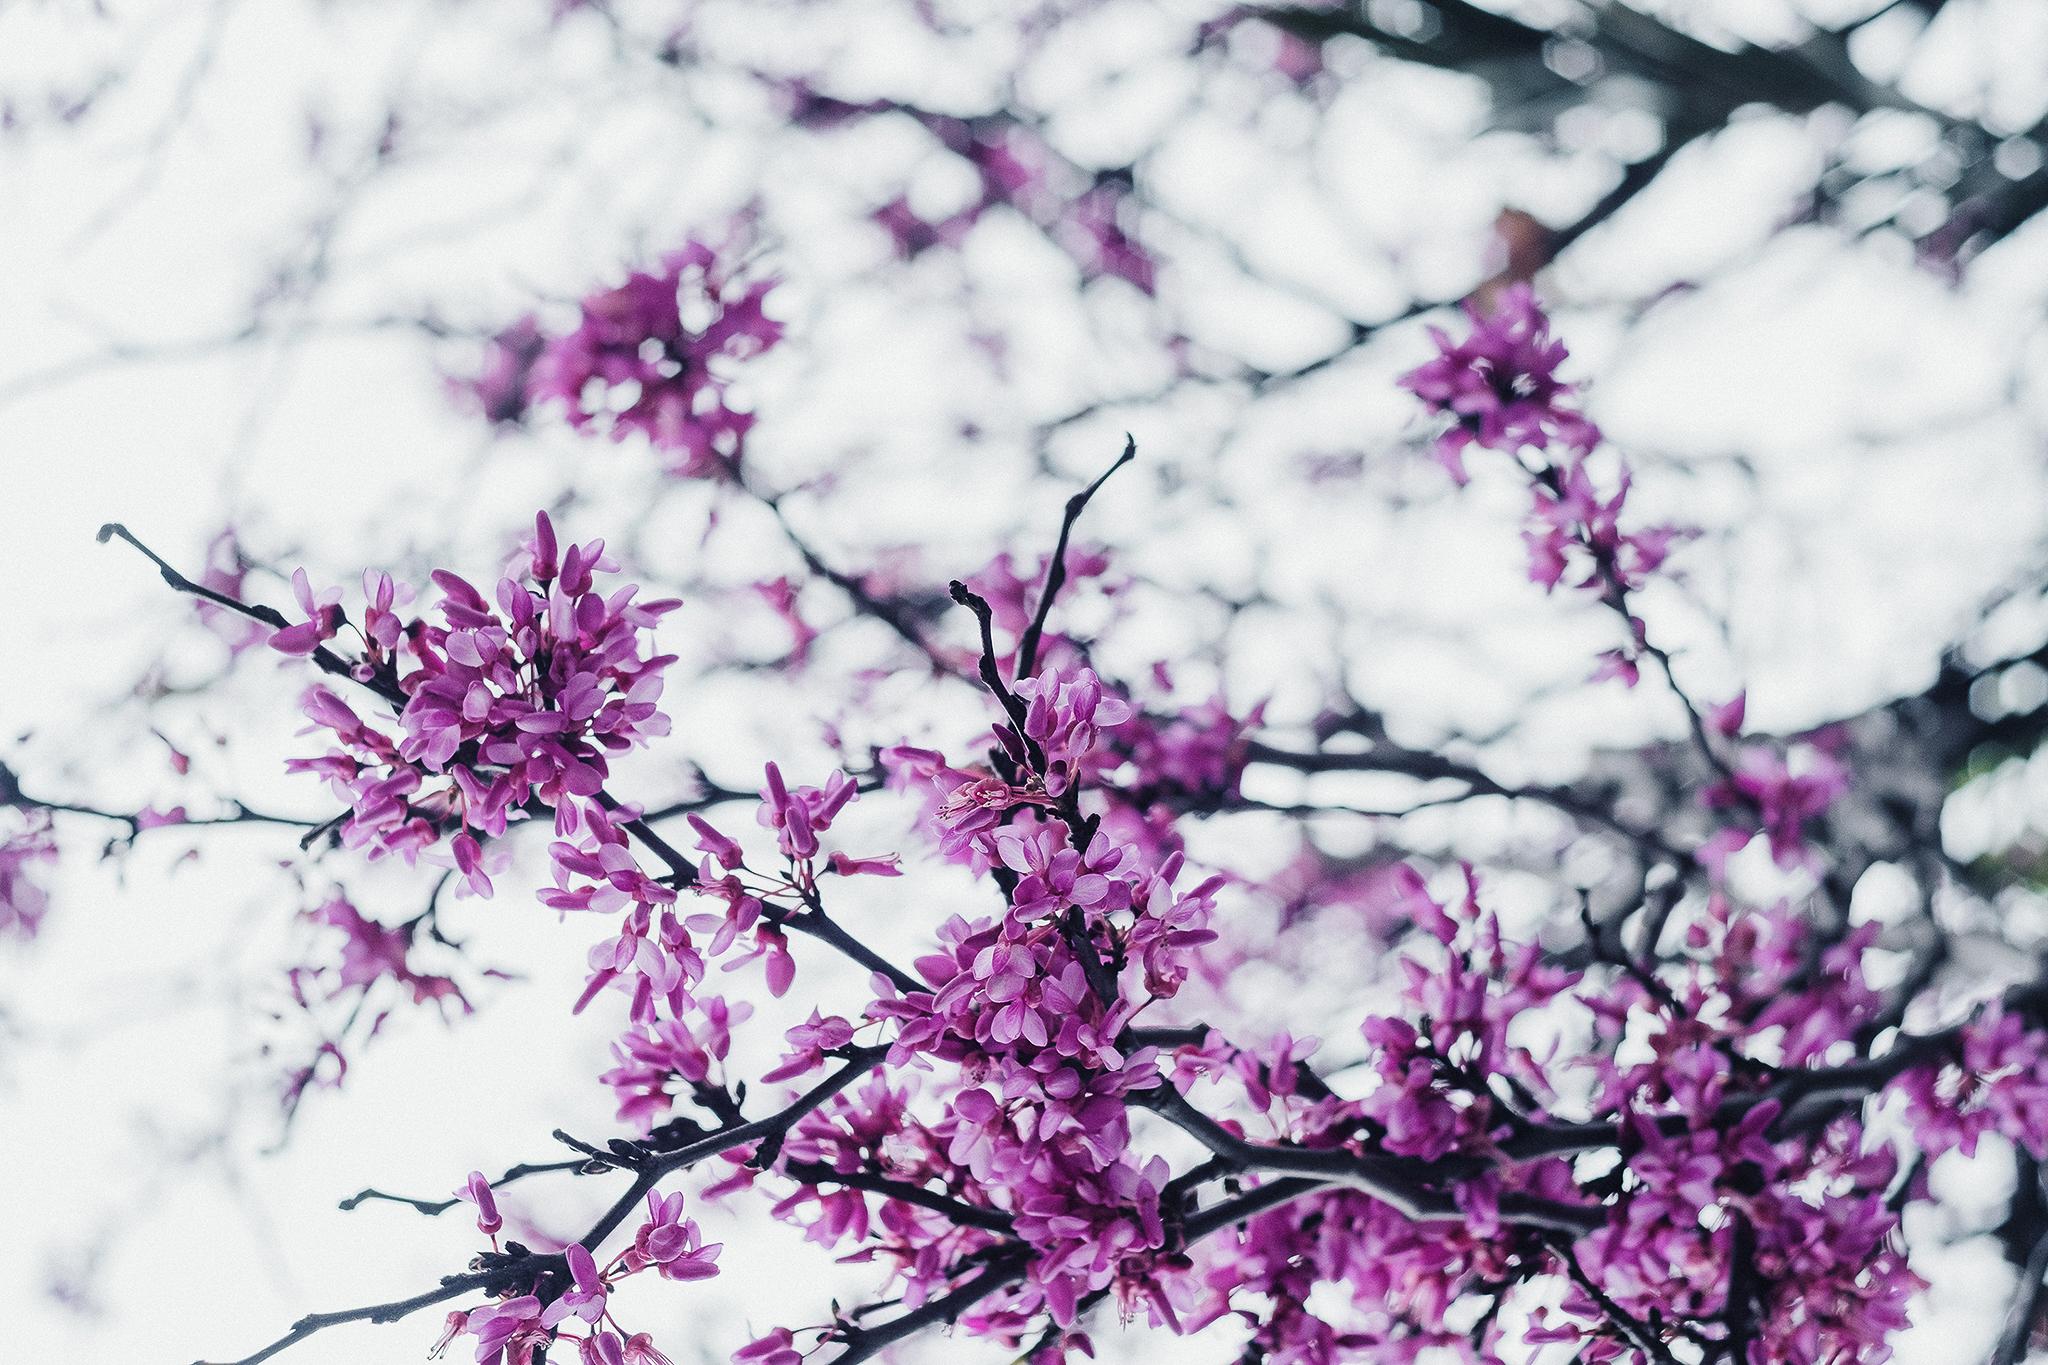 388_Floral [by @OsseGrecaSinare]_Blog.jpg